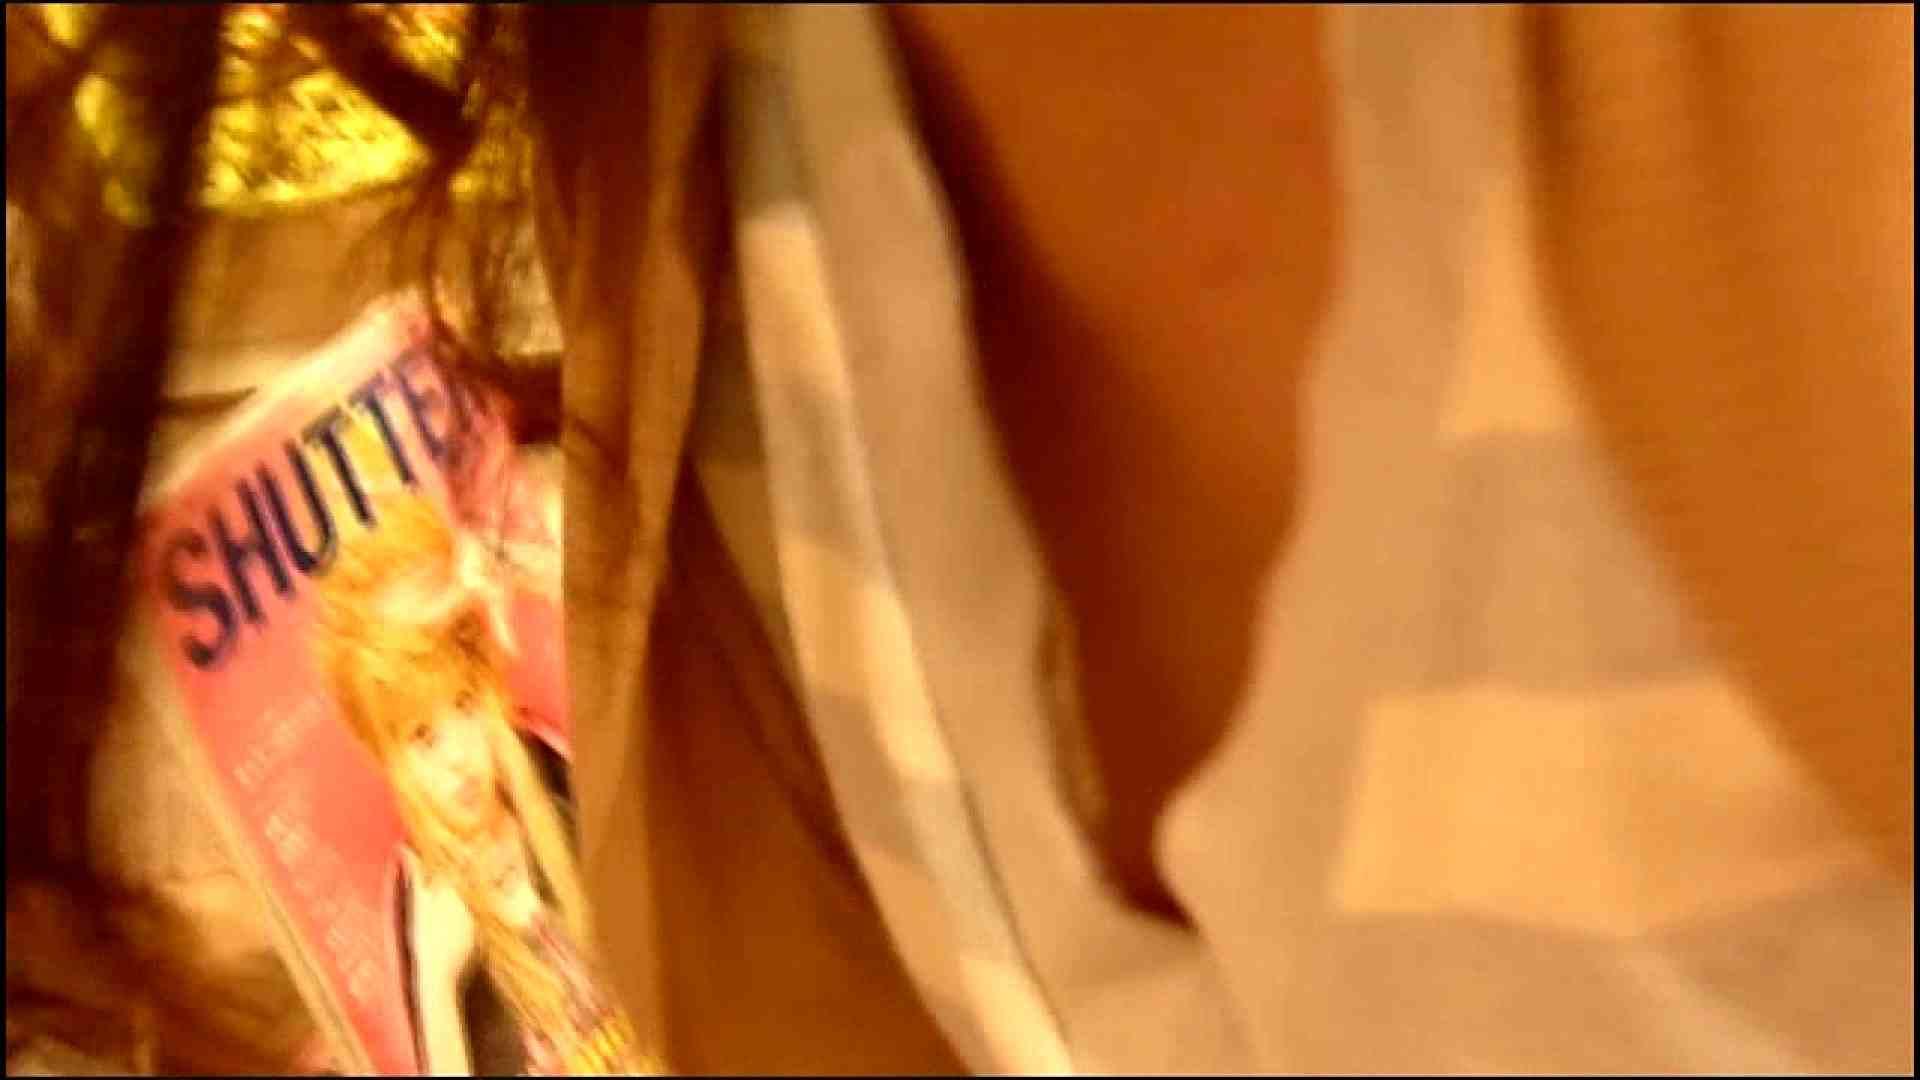 NO.3 某イオNN店内のエレベーター前でケータイに夢中な女の子 0  50連発 8